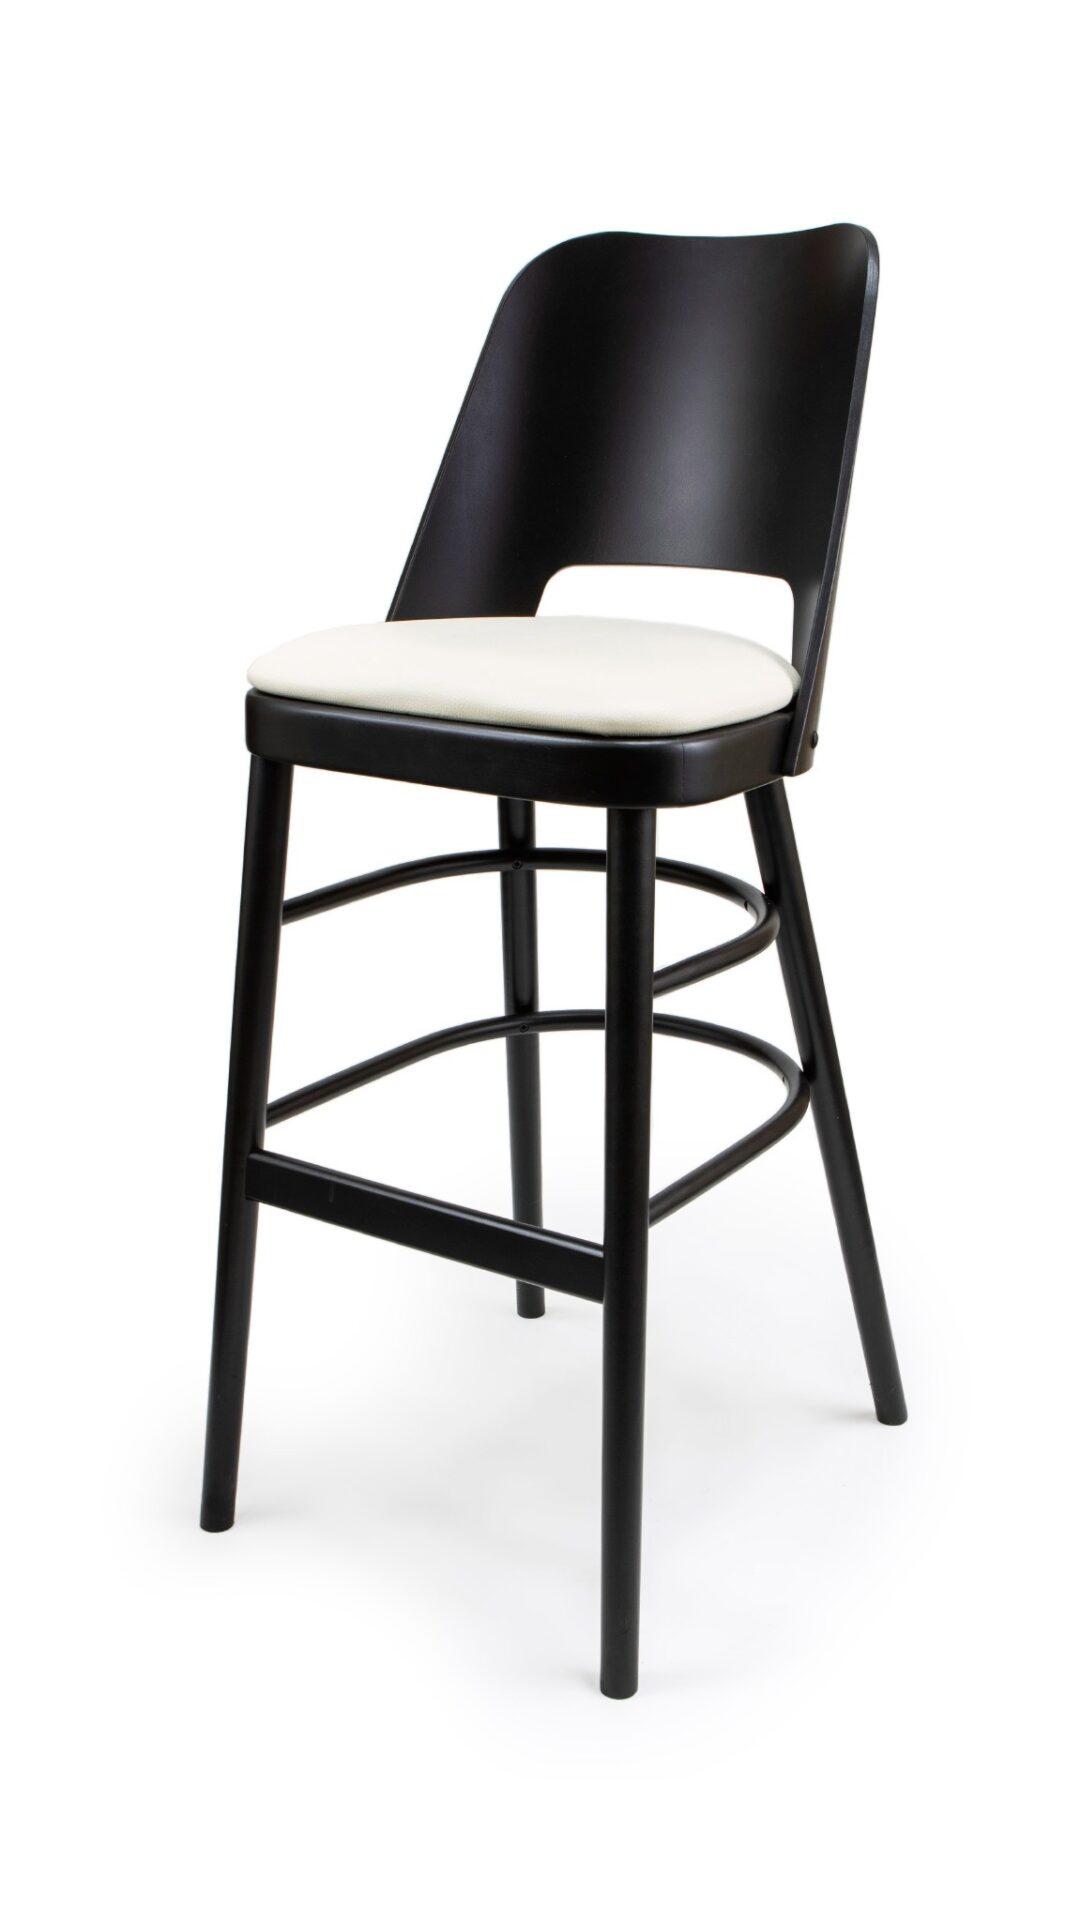 Solid Wood bar stool made of Beech - 1334B